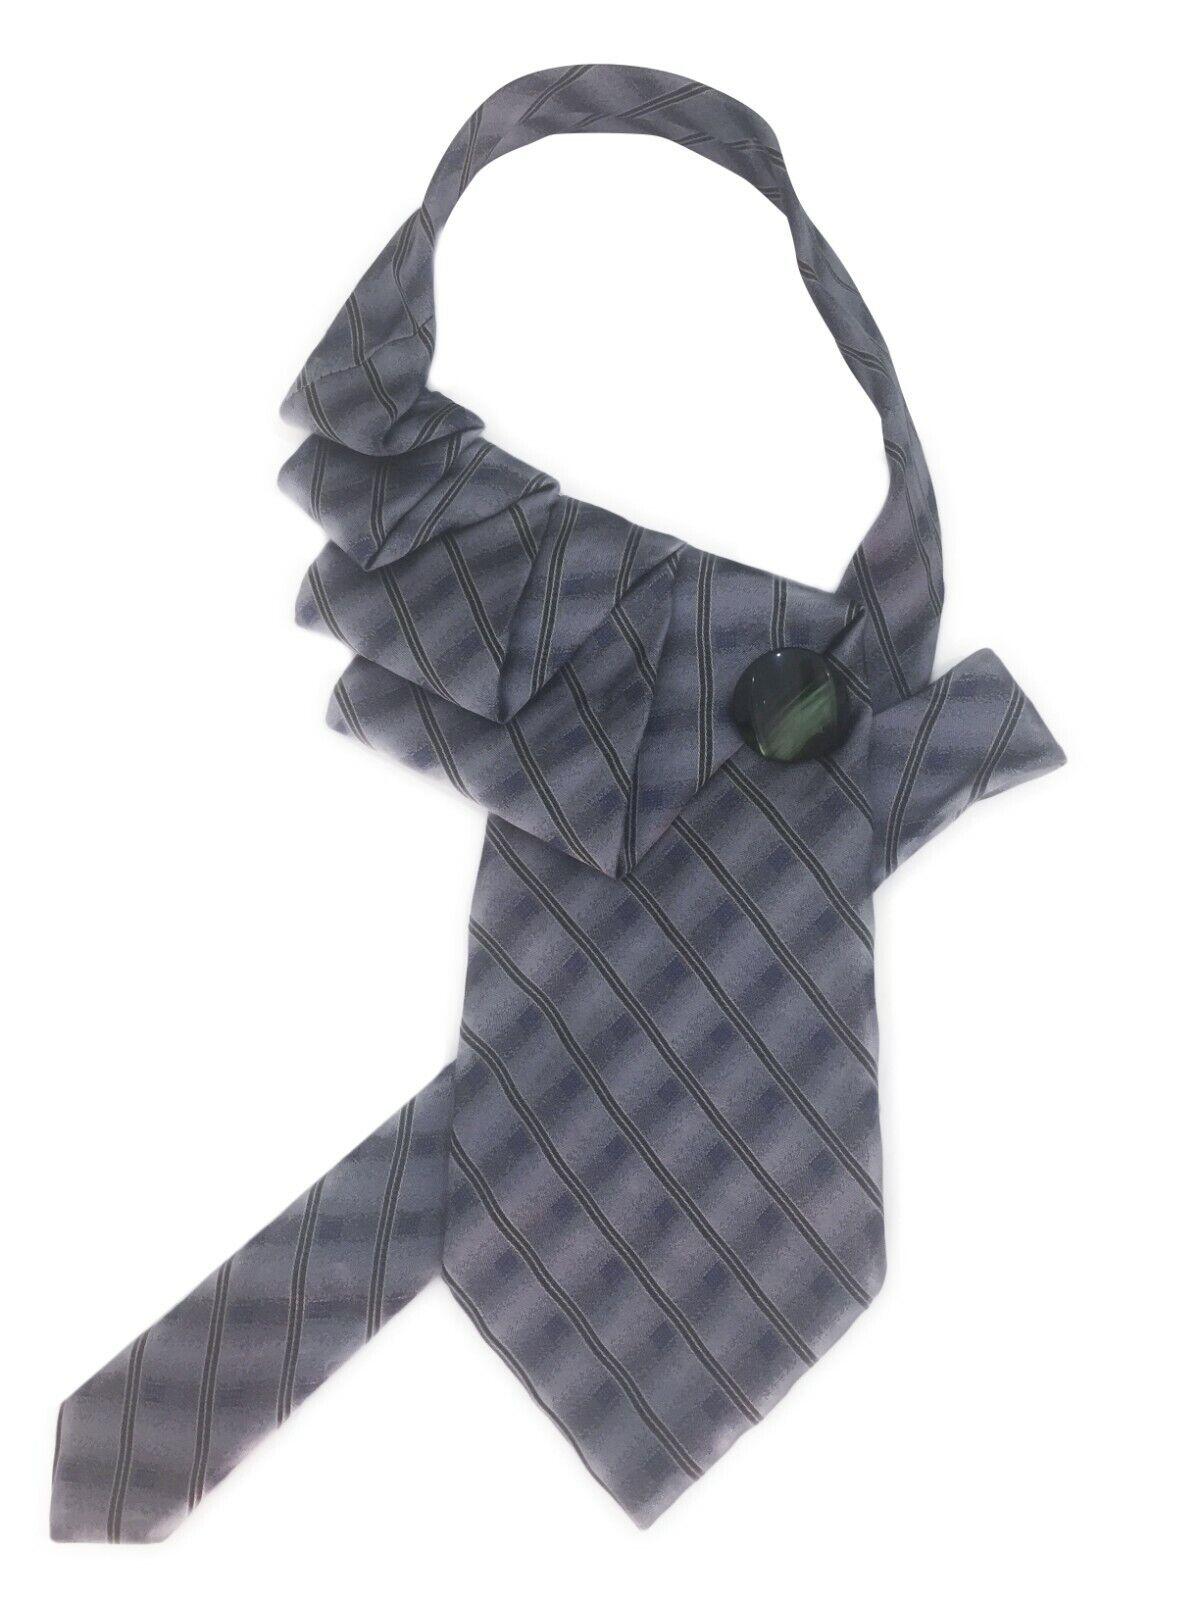 Tie women's. Silk Italy. Collar, necklace, necktie, cravat. Hand-made